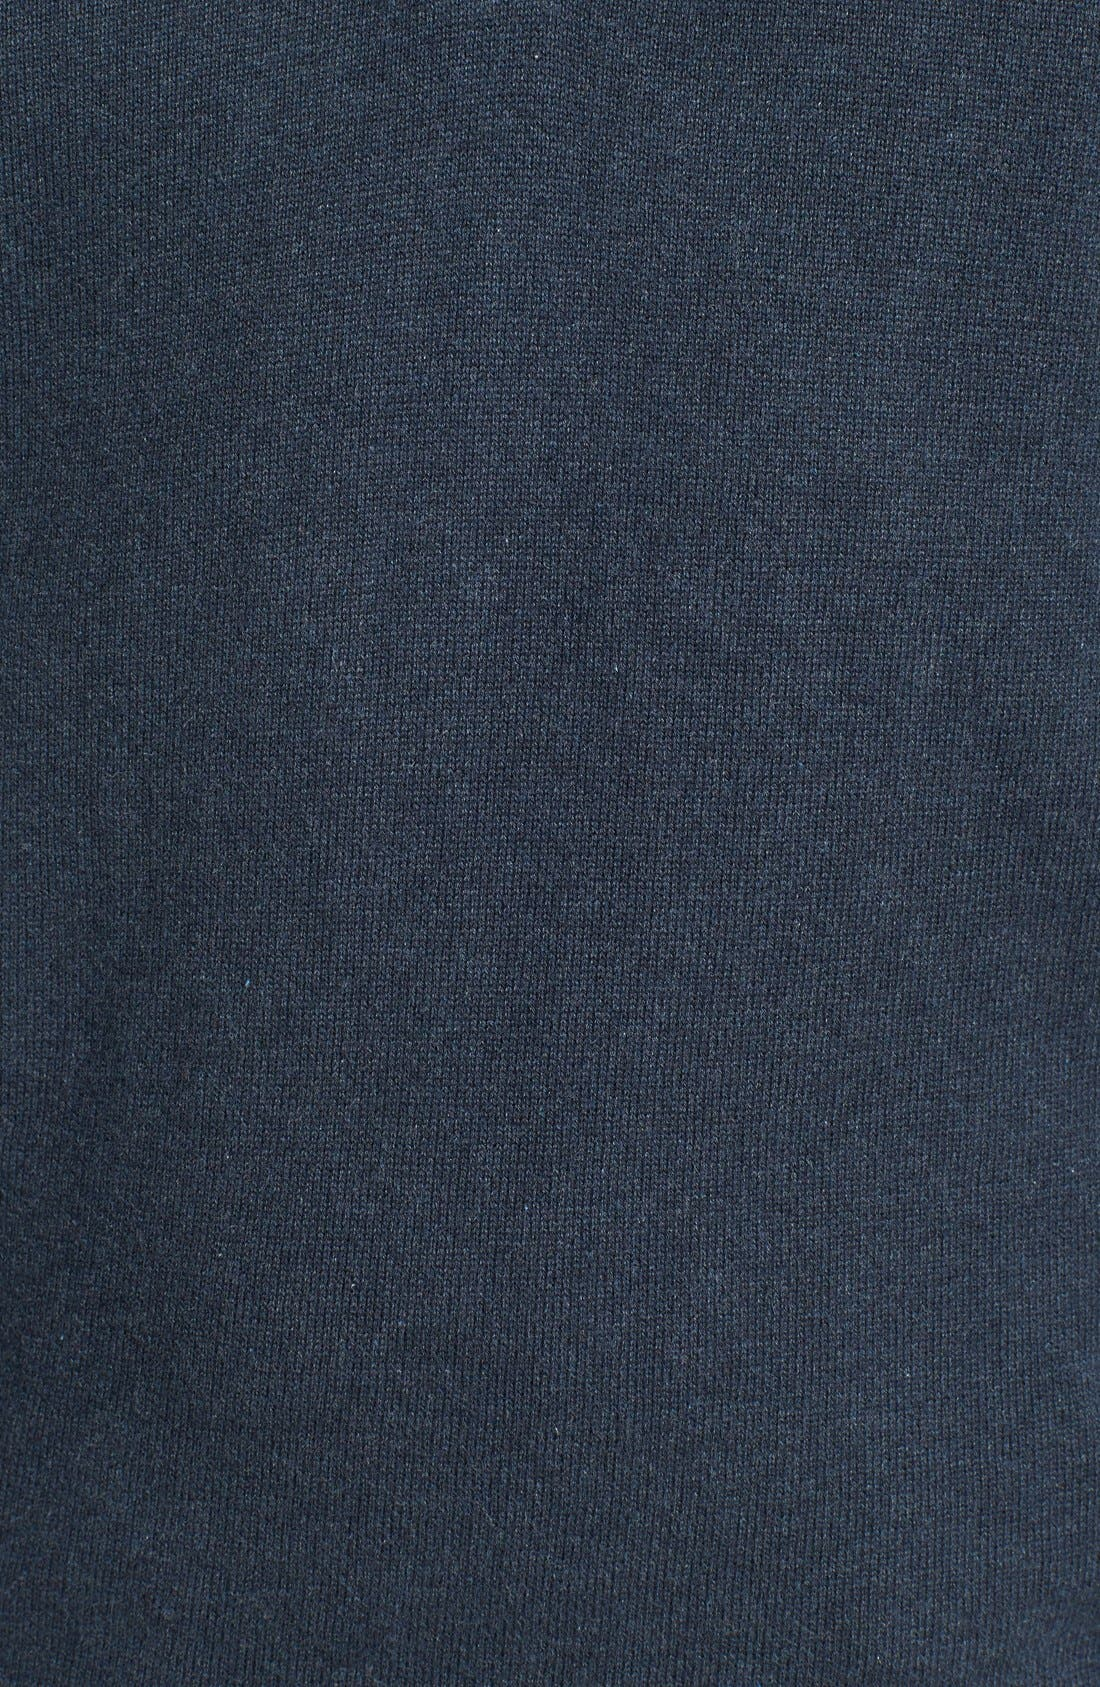 CUTTER & BUCK,                             Broadview Half Zip Sweater,                             Alternate thumbnail 4, color,                             480